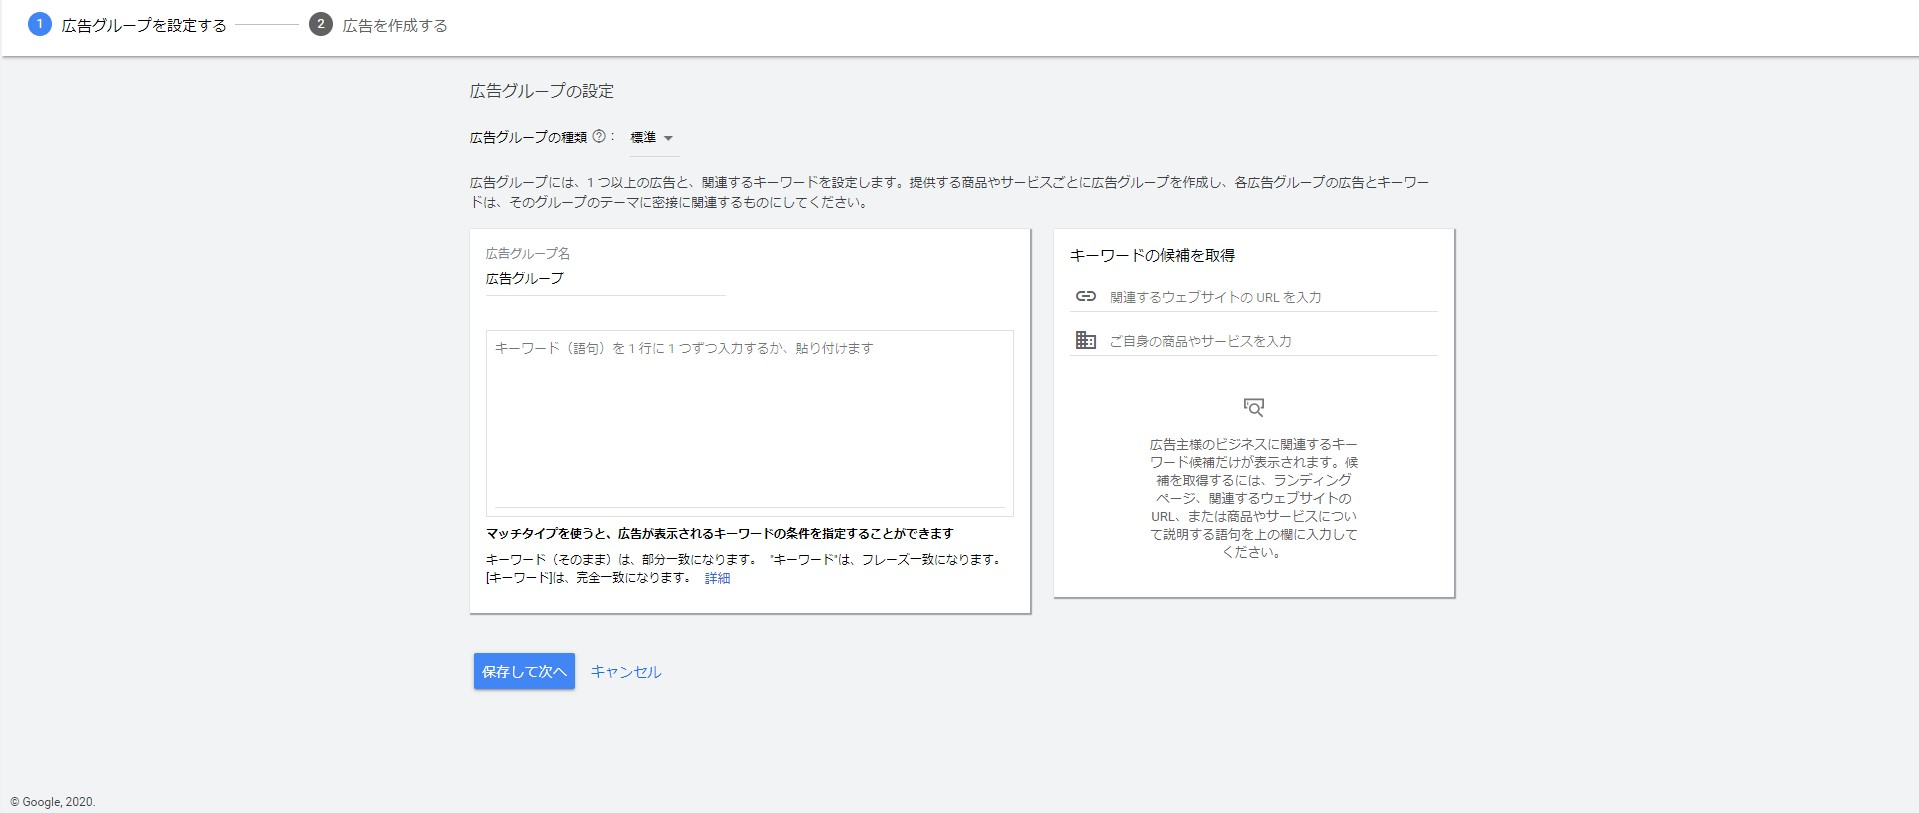 Google広告の広告グループ作成画面